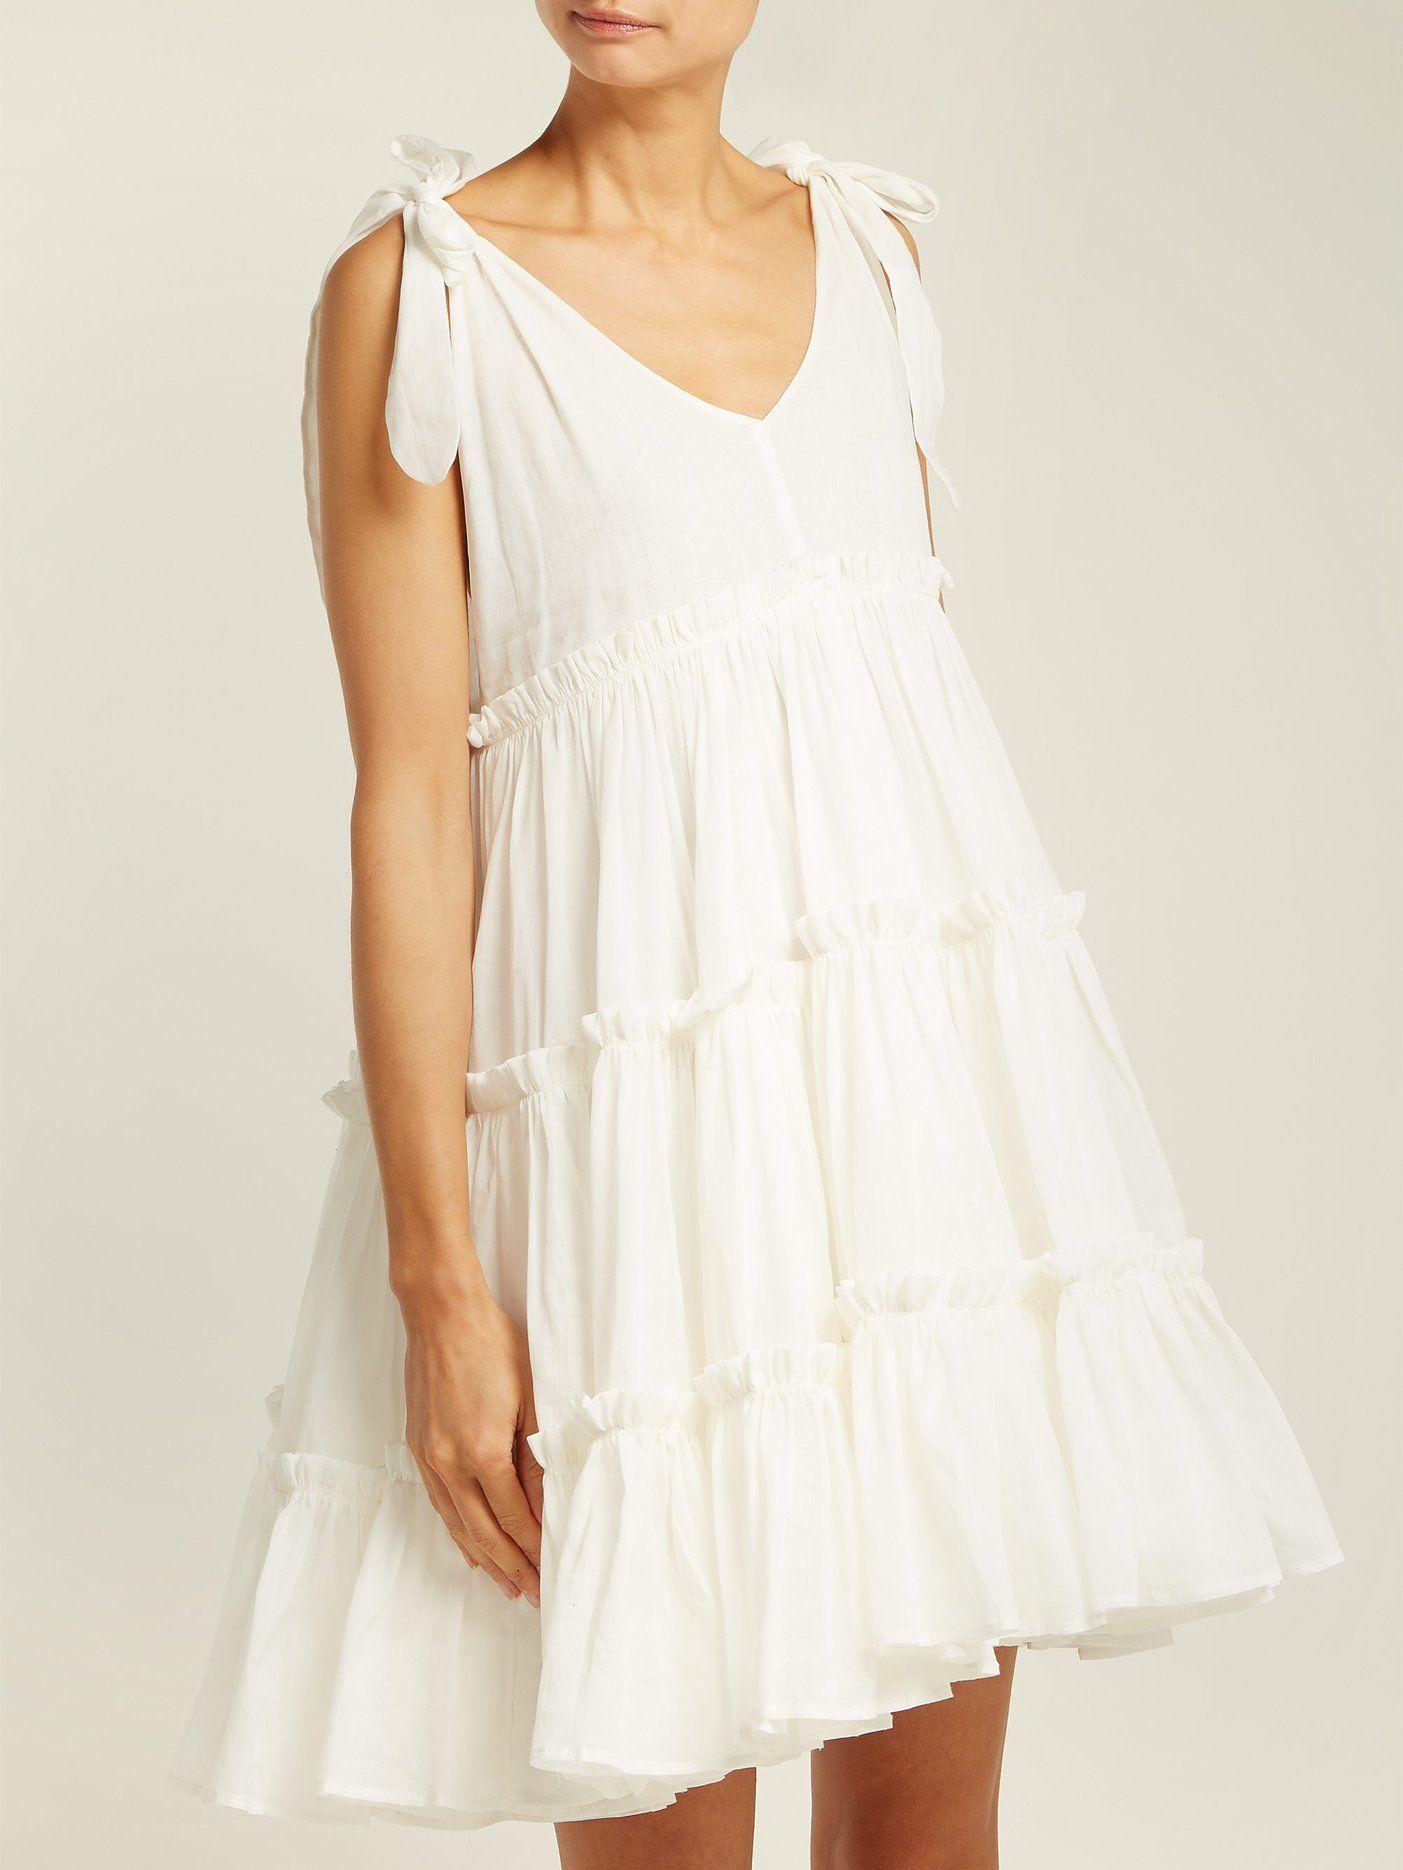 Tiered Ruffle Ramie Mini Dress Innika Choo Matchesfashion Com Uk Mini Dress Babydoll Dress Pattern Tiered Ruffle Dress [ 1870 x 1403 Pixel ]